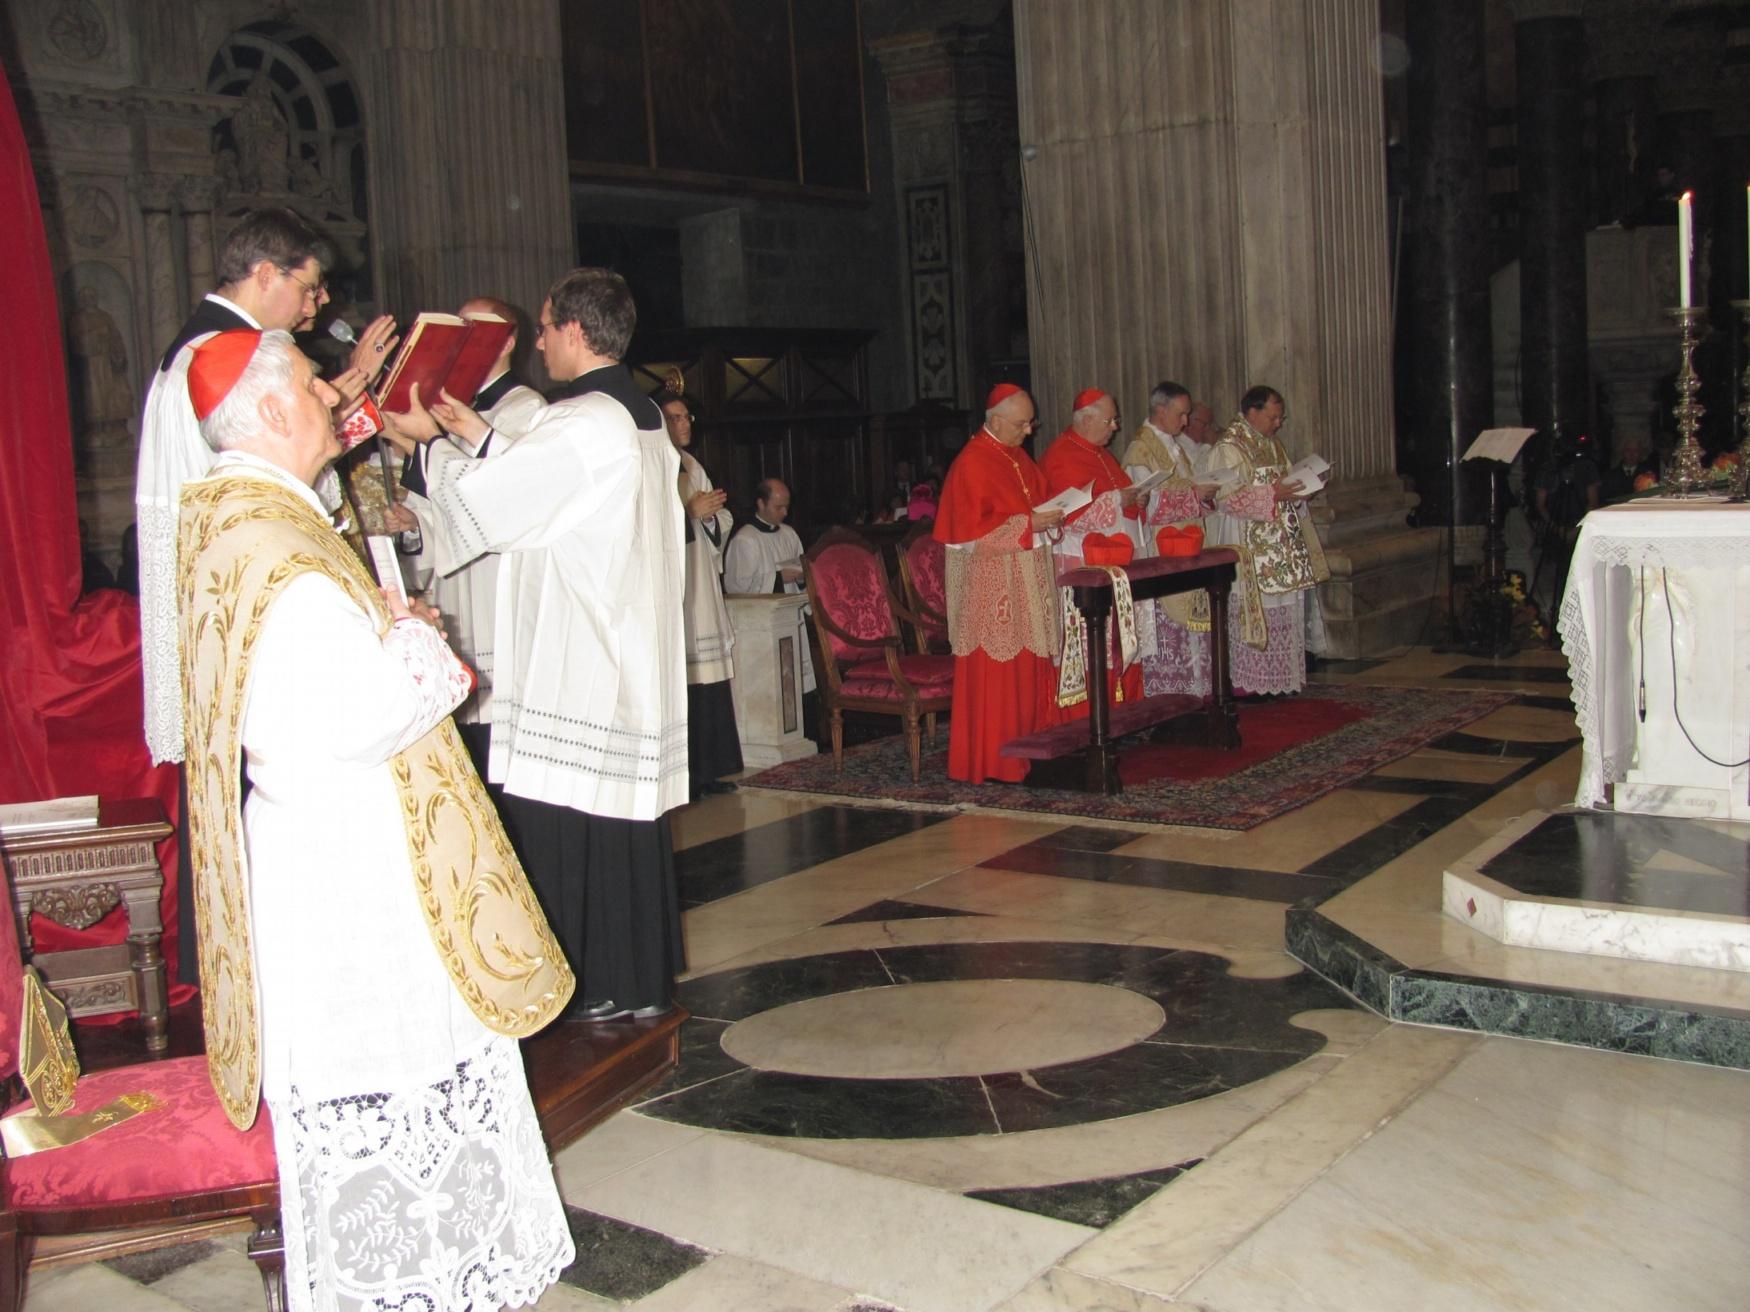 ordinazione_episcopale_gallese_2012-11-11-15-48-08